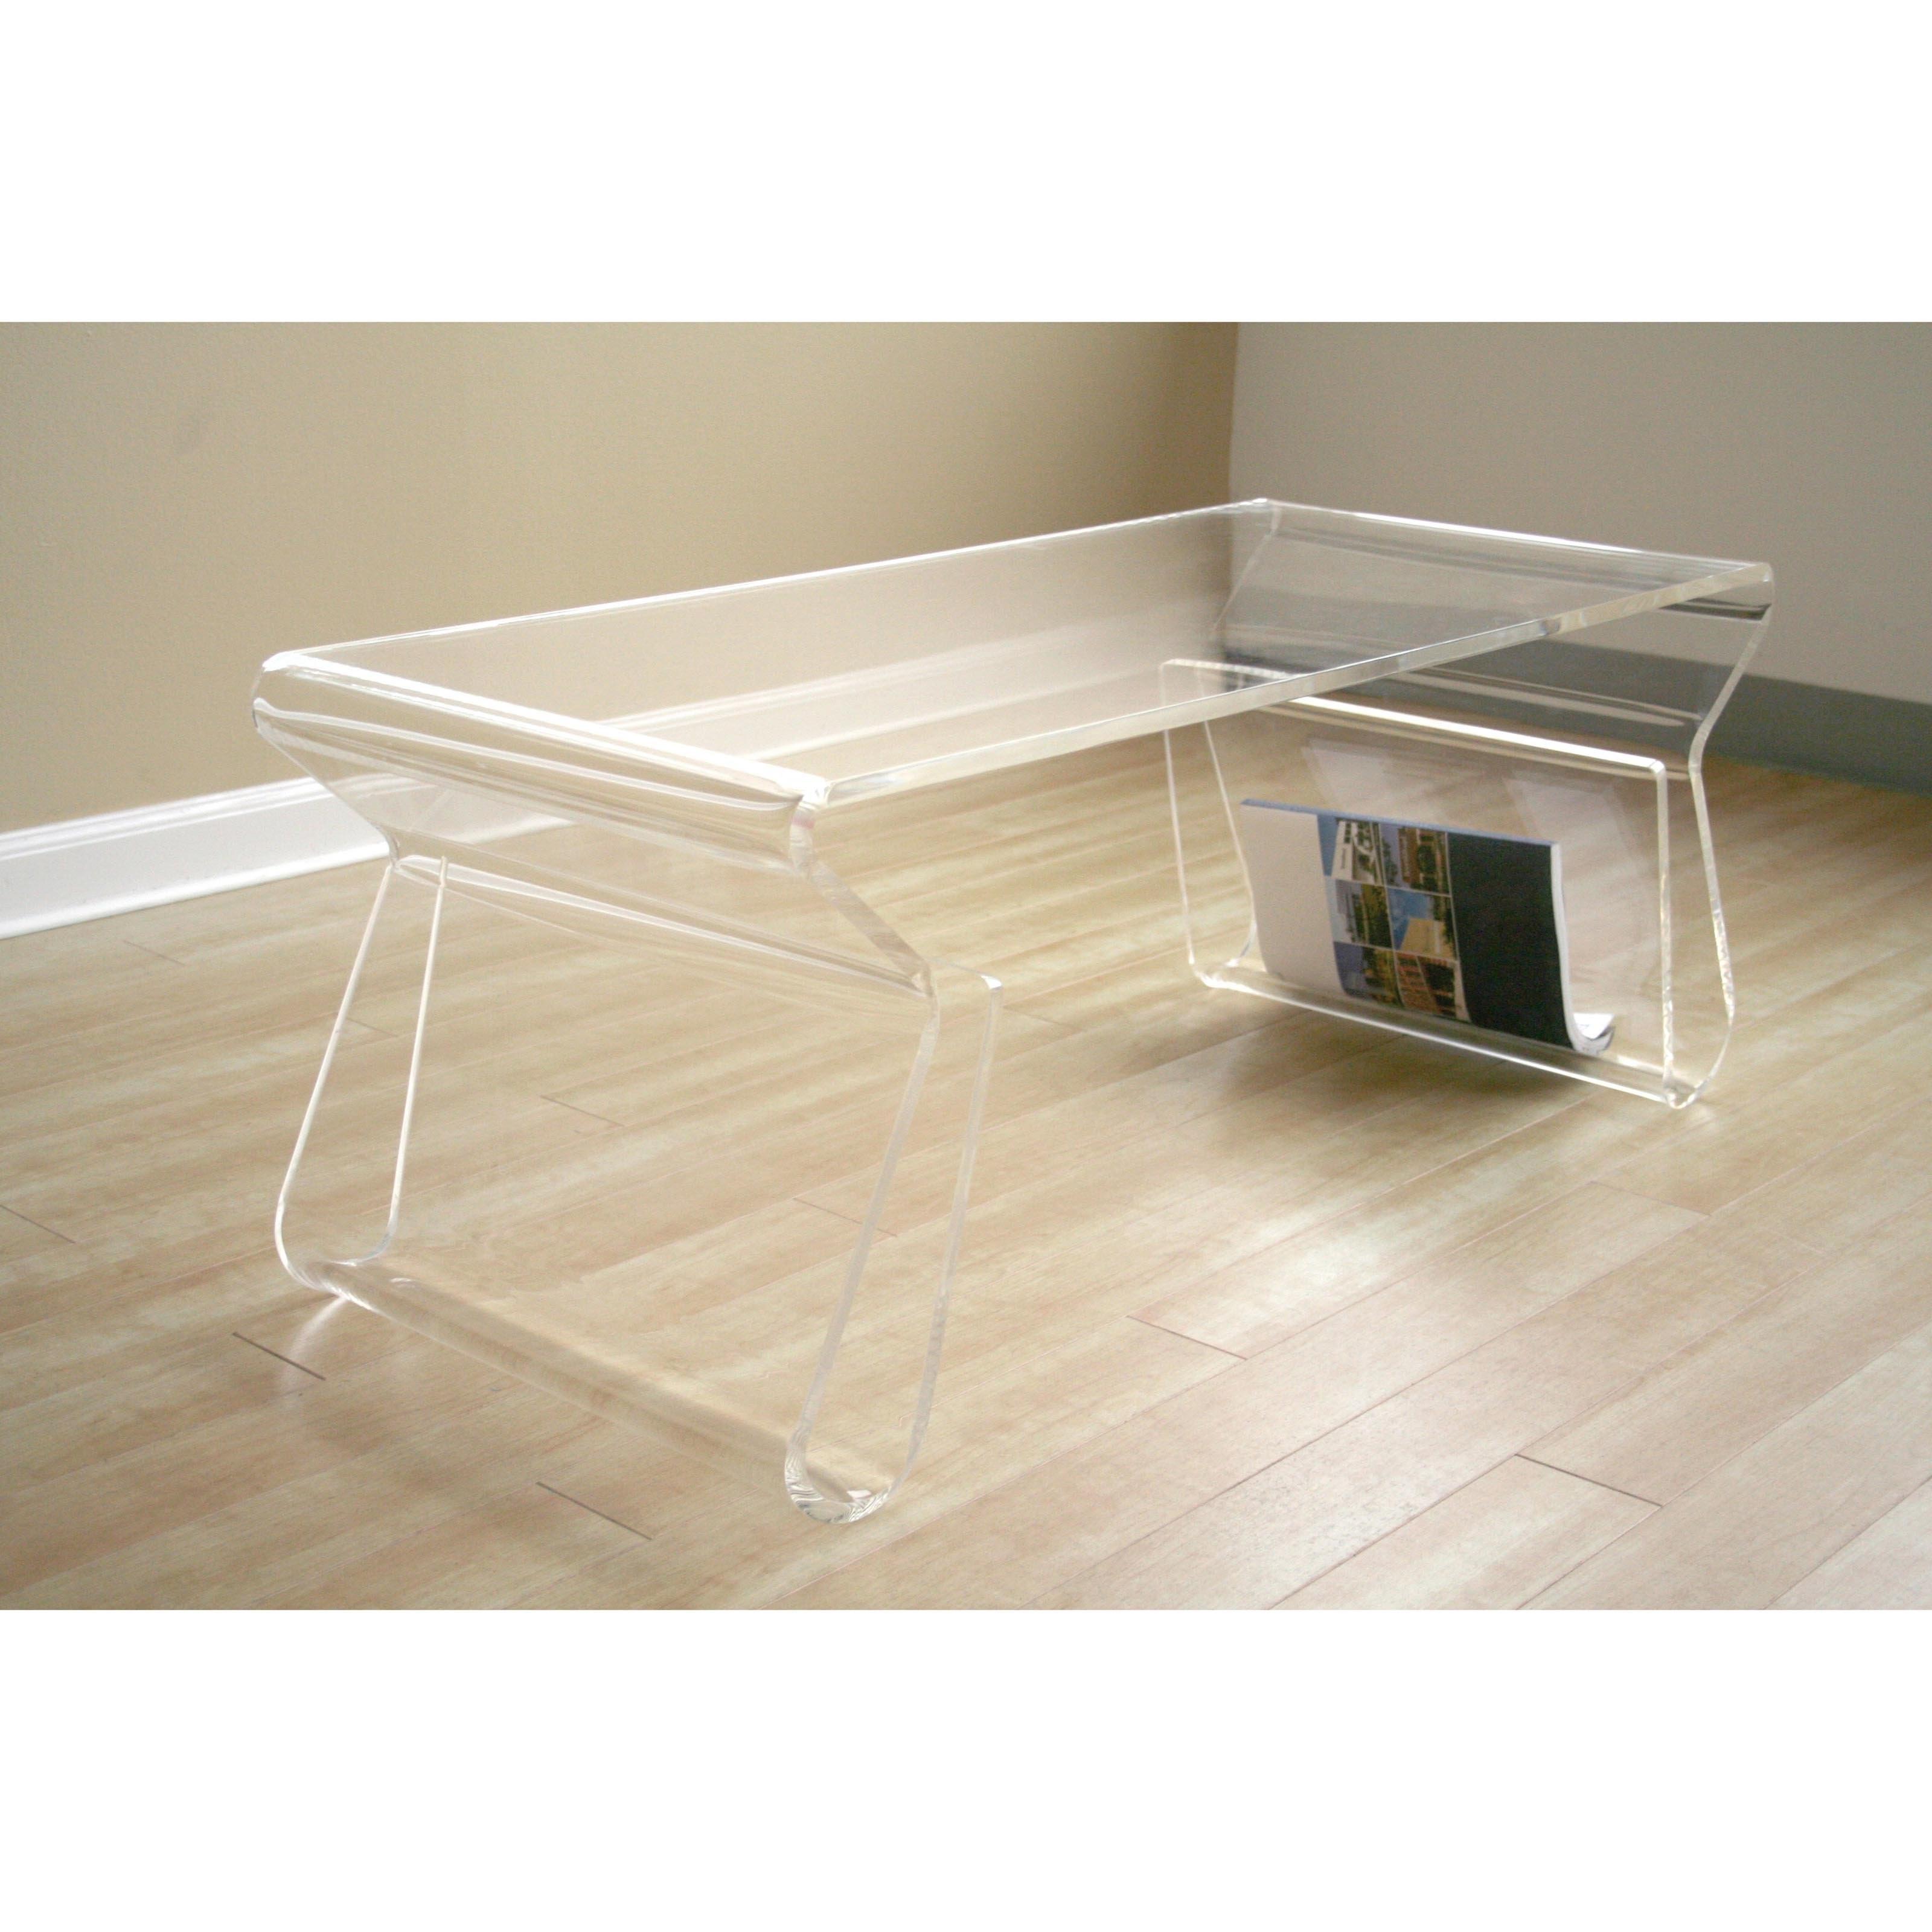 Transparent Coffee Tables Peekaboo Acrylic Table Reviews Cb2 Clear regarding Peekaboo Acrylic Coffee Tables (Image 30 of 30)